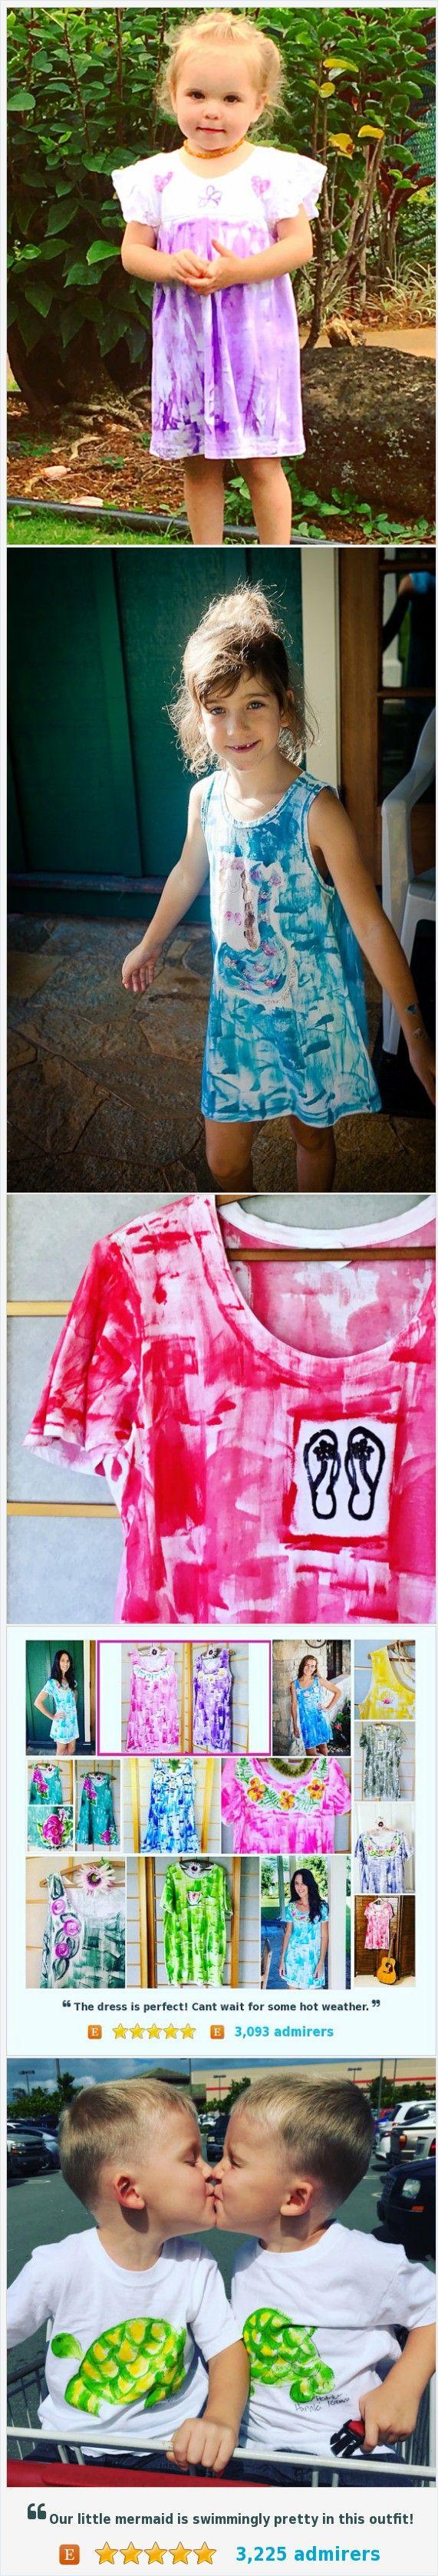 Petrina - Kaua'i - Hand Painted Clothes by PetrinaBlakely #etsykids #shoppingwomen #TIntegrityT @PromoteMyShop @HandmadeHour @HawaiiRT https://www.etsy.com/shop/PetrinaBlakely?ref=hdr_shop_menu&section_id=11067902